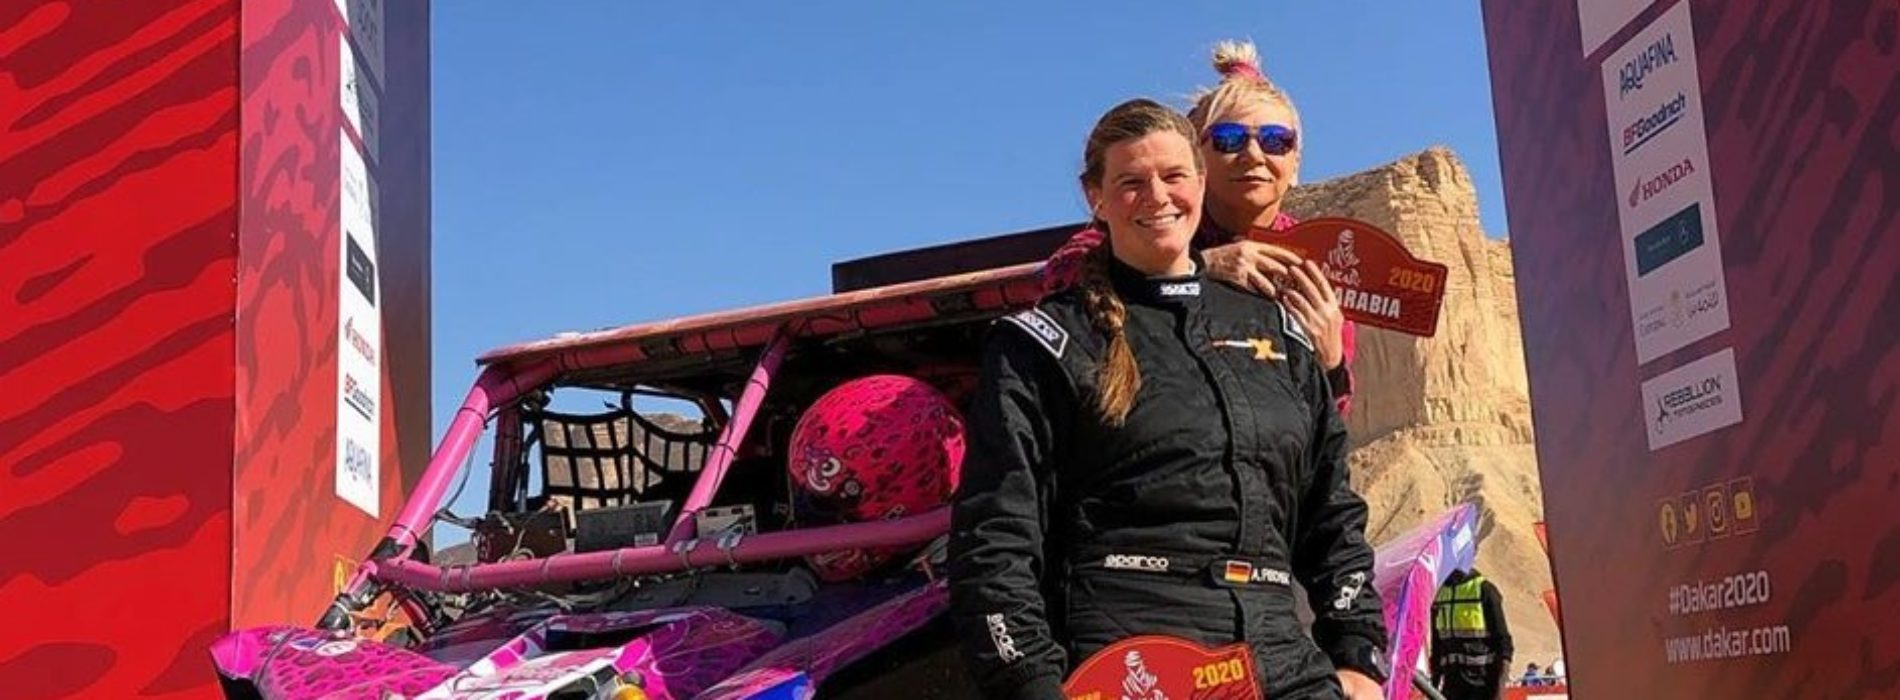 MXLink Live invites guests Camelia Liparoti and Annett Fisher- duo racing 2020 Dakar Rally SSV class